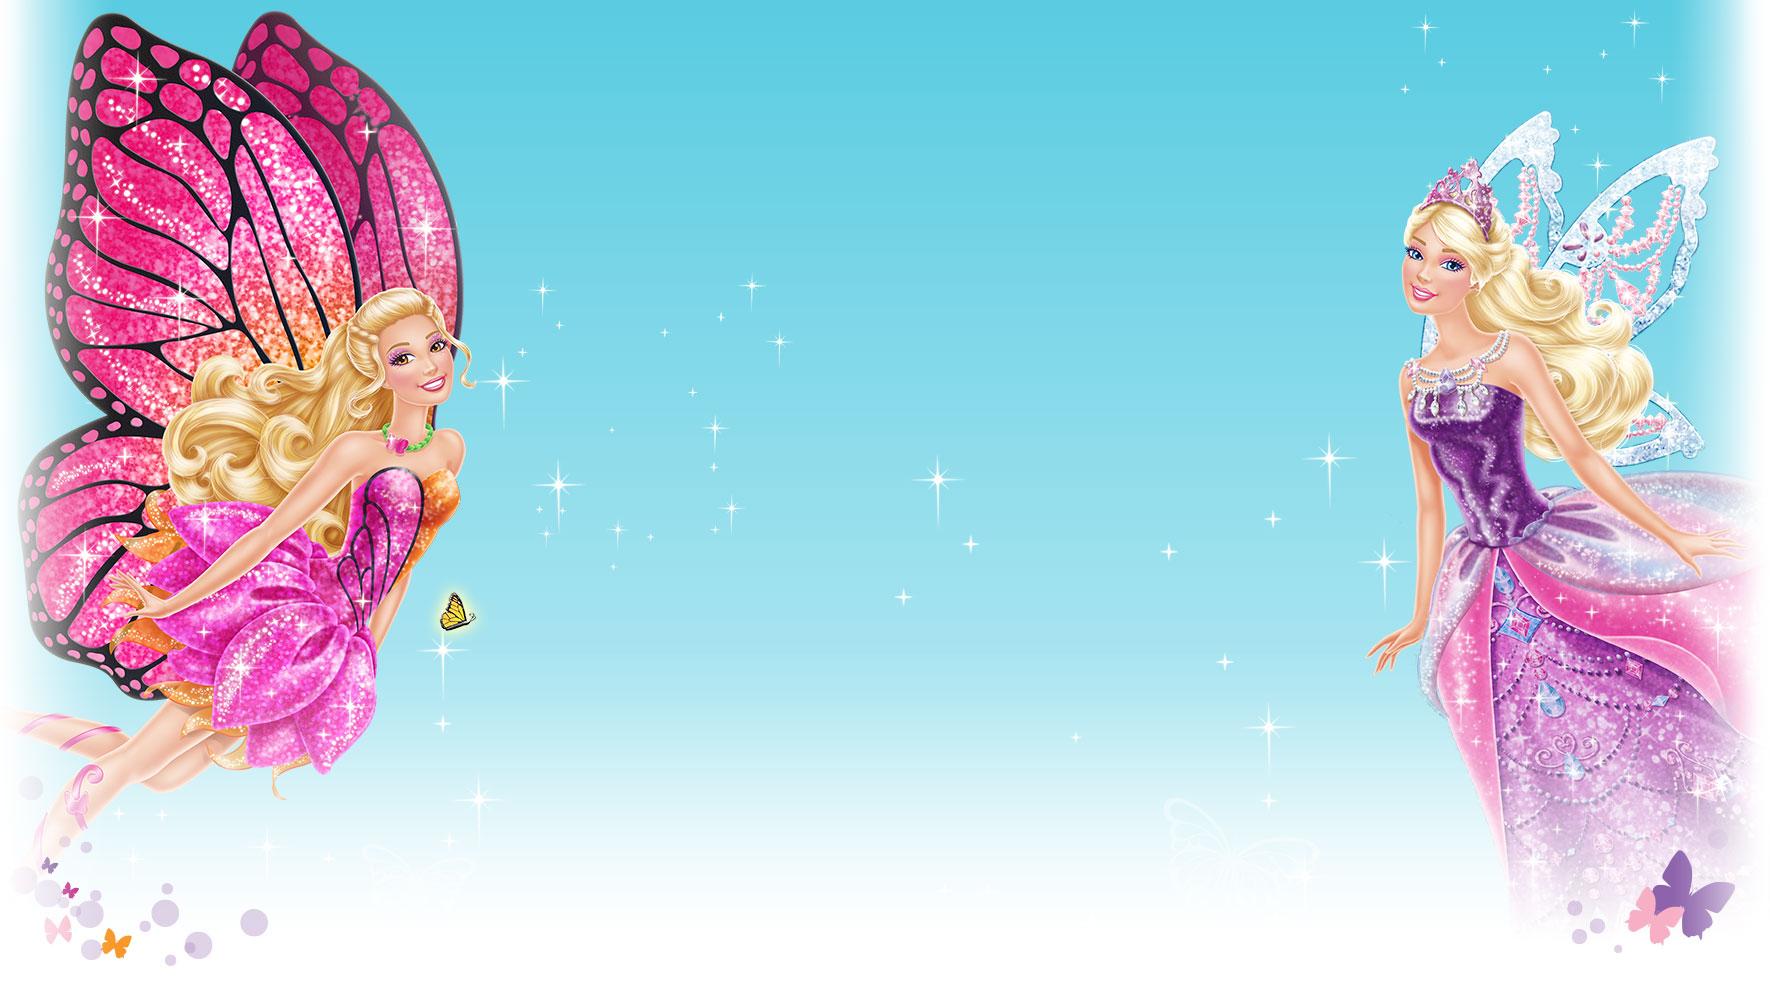 Popular Wallpaper Butterfly Barbie - 20150704081351  Snapshot_152780.jpg/revision/20150704081351